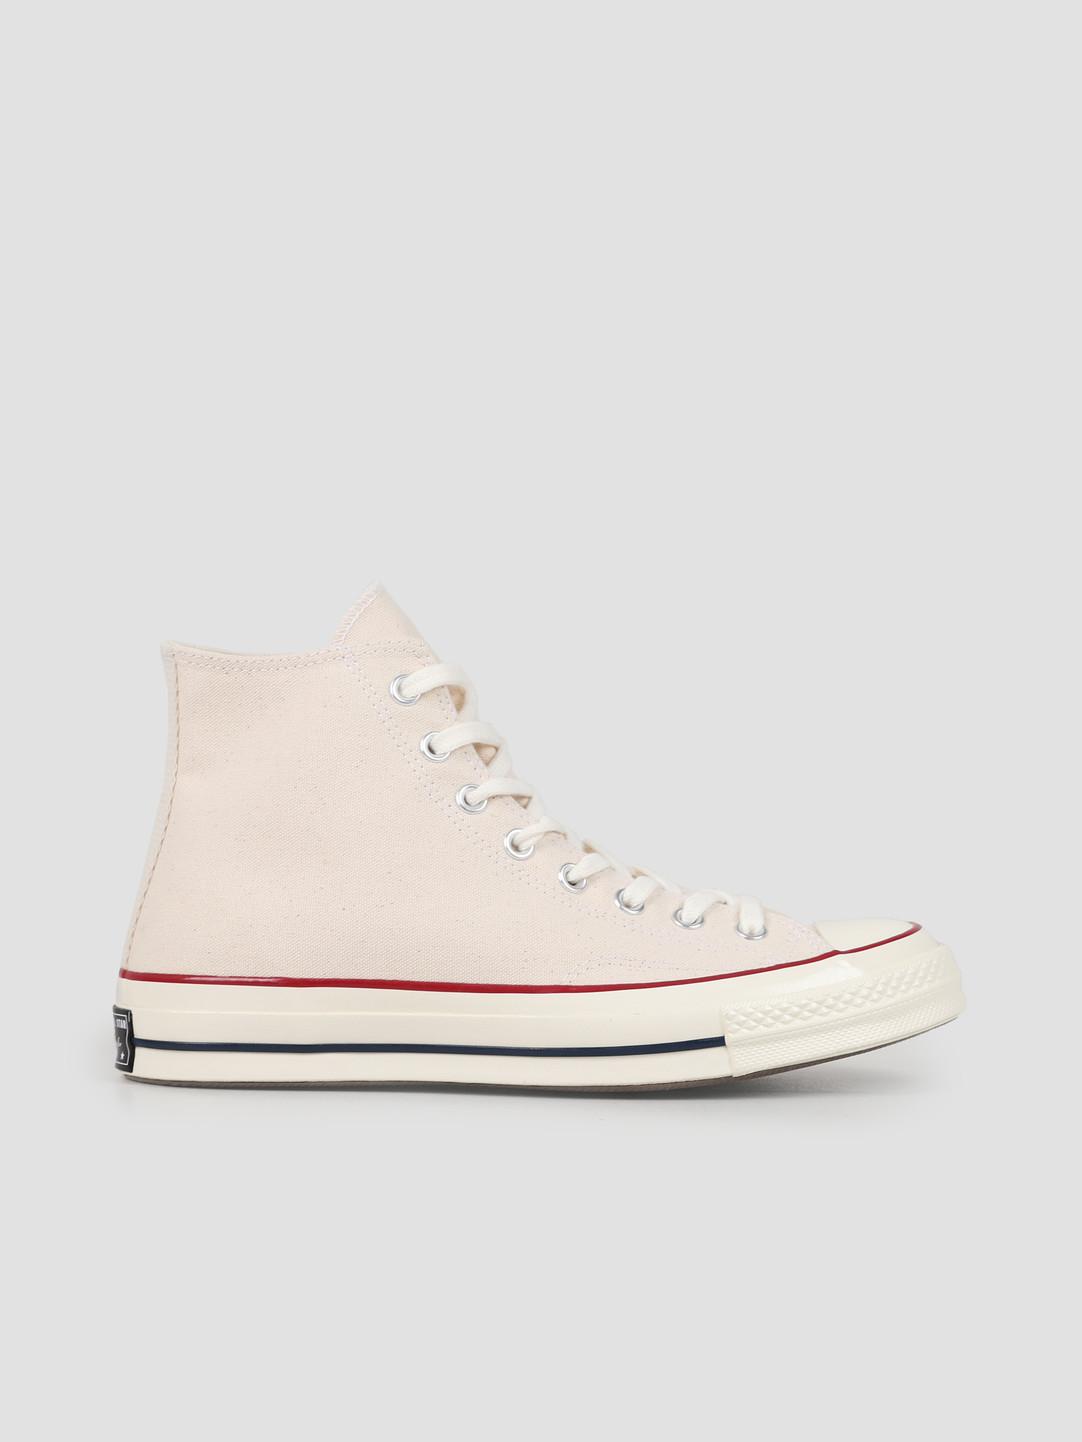 Converse Converse Chuck 70 HI Parchment Garnet Egret 162053C